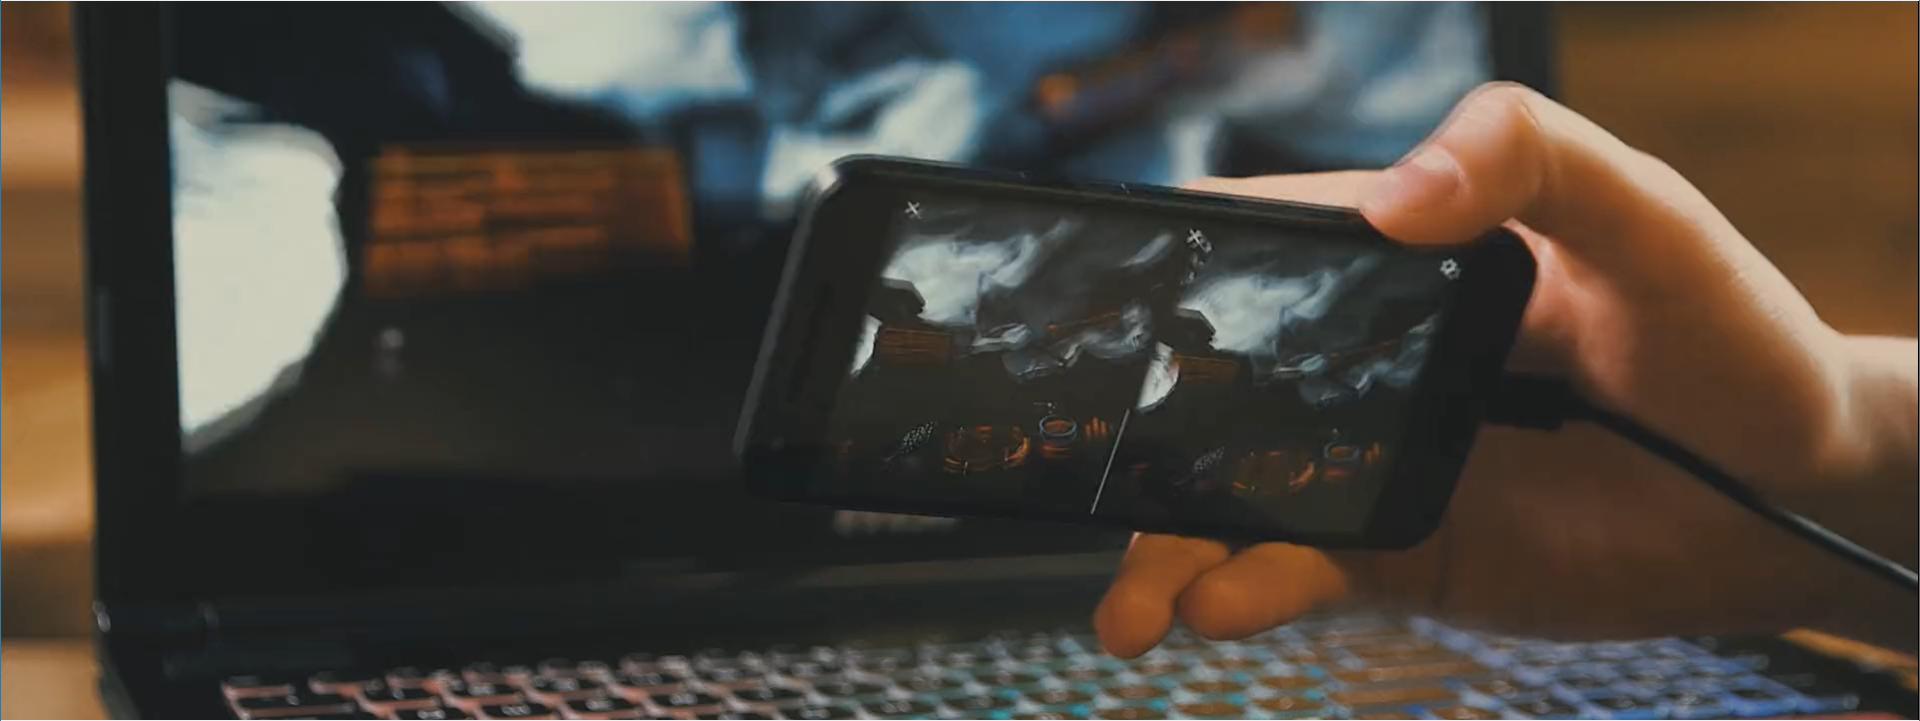 37e2271367c7 VRidge - Play PC VR on your Cardboard